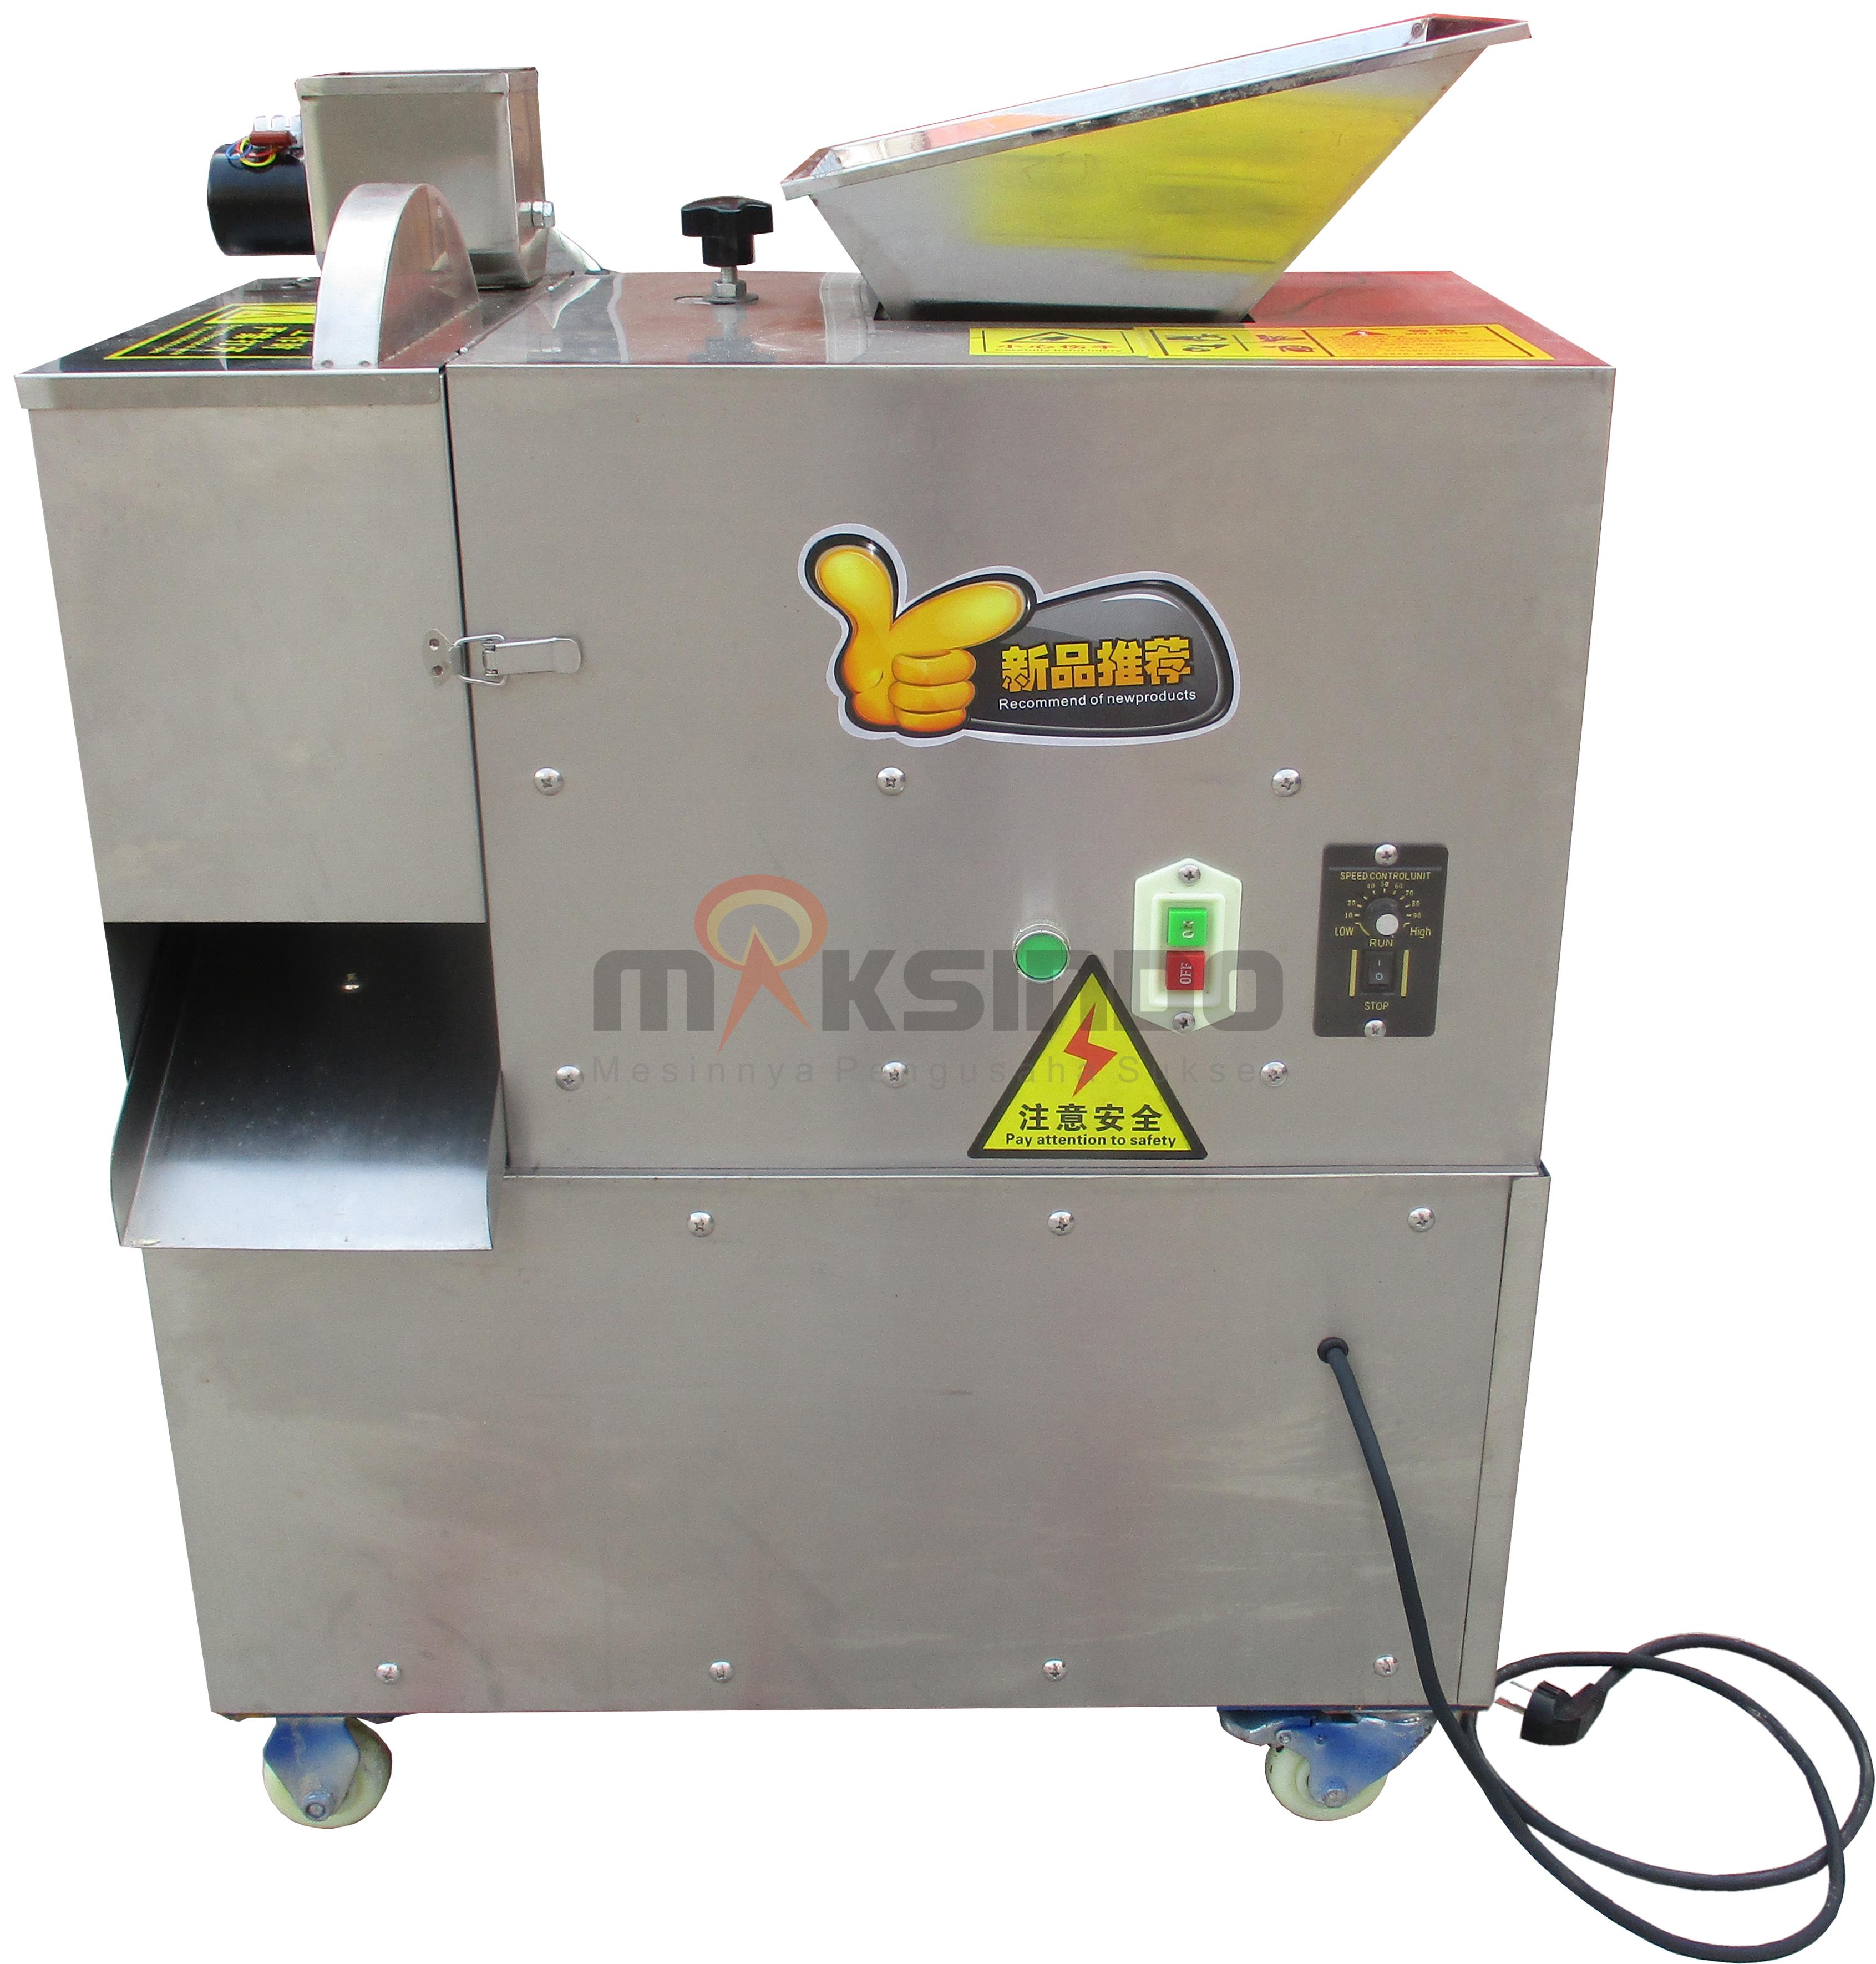 Mesin Pembagi Adonan 4-230 gr (Dough Cutter)